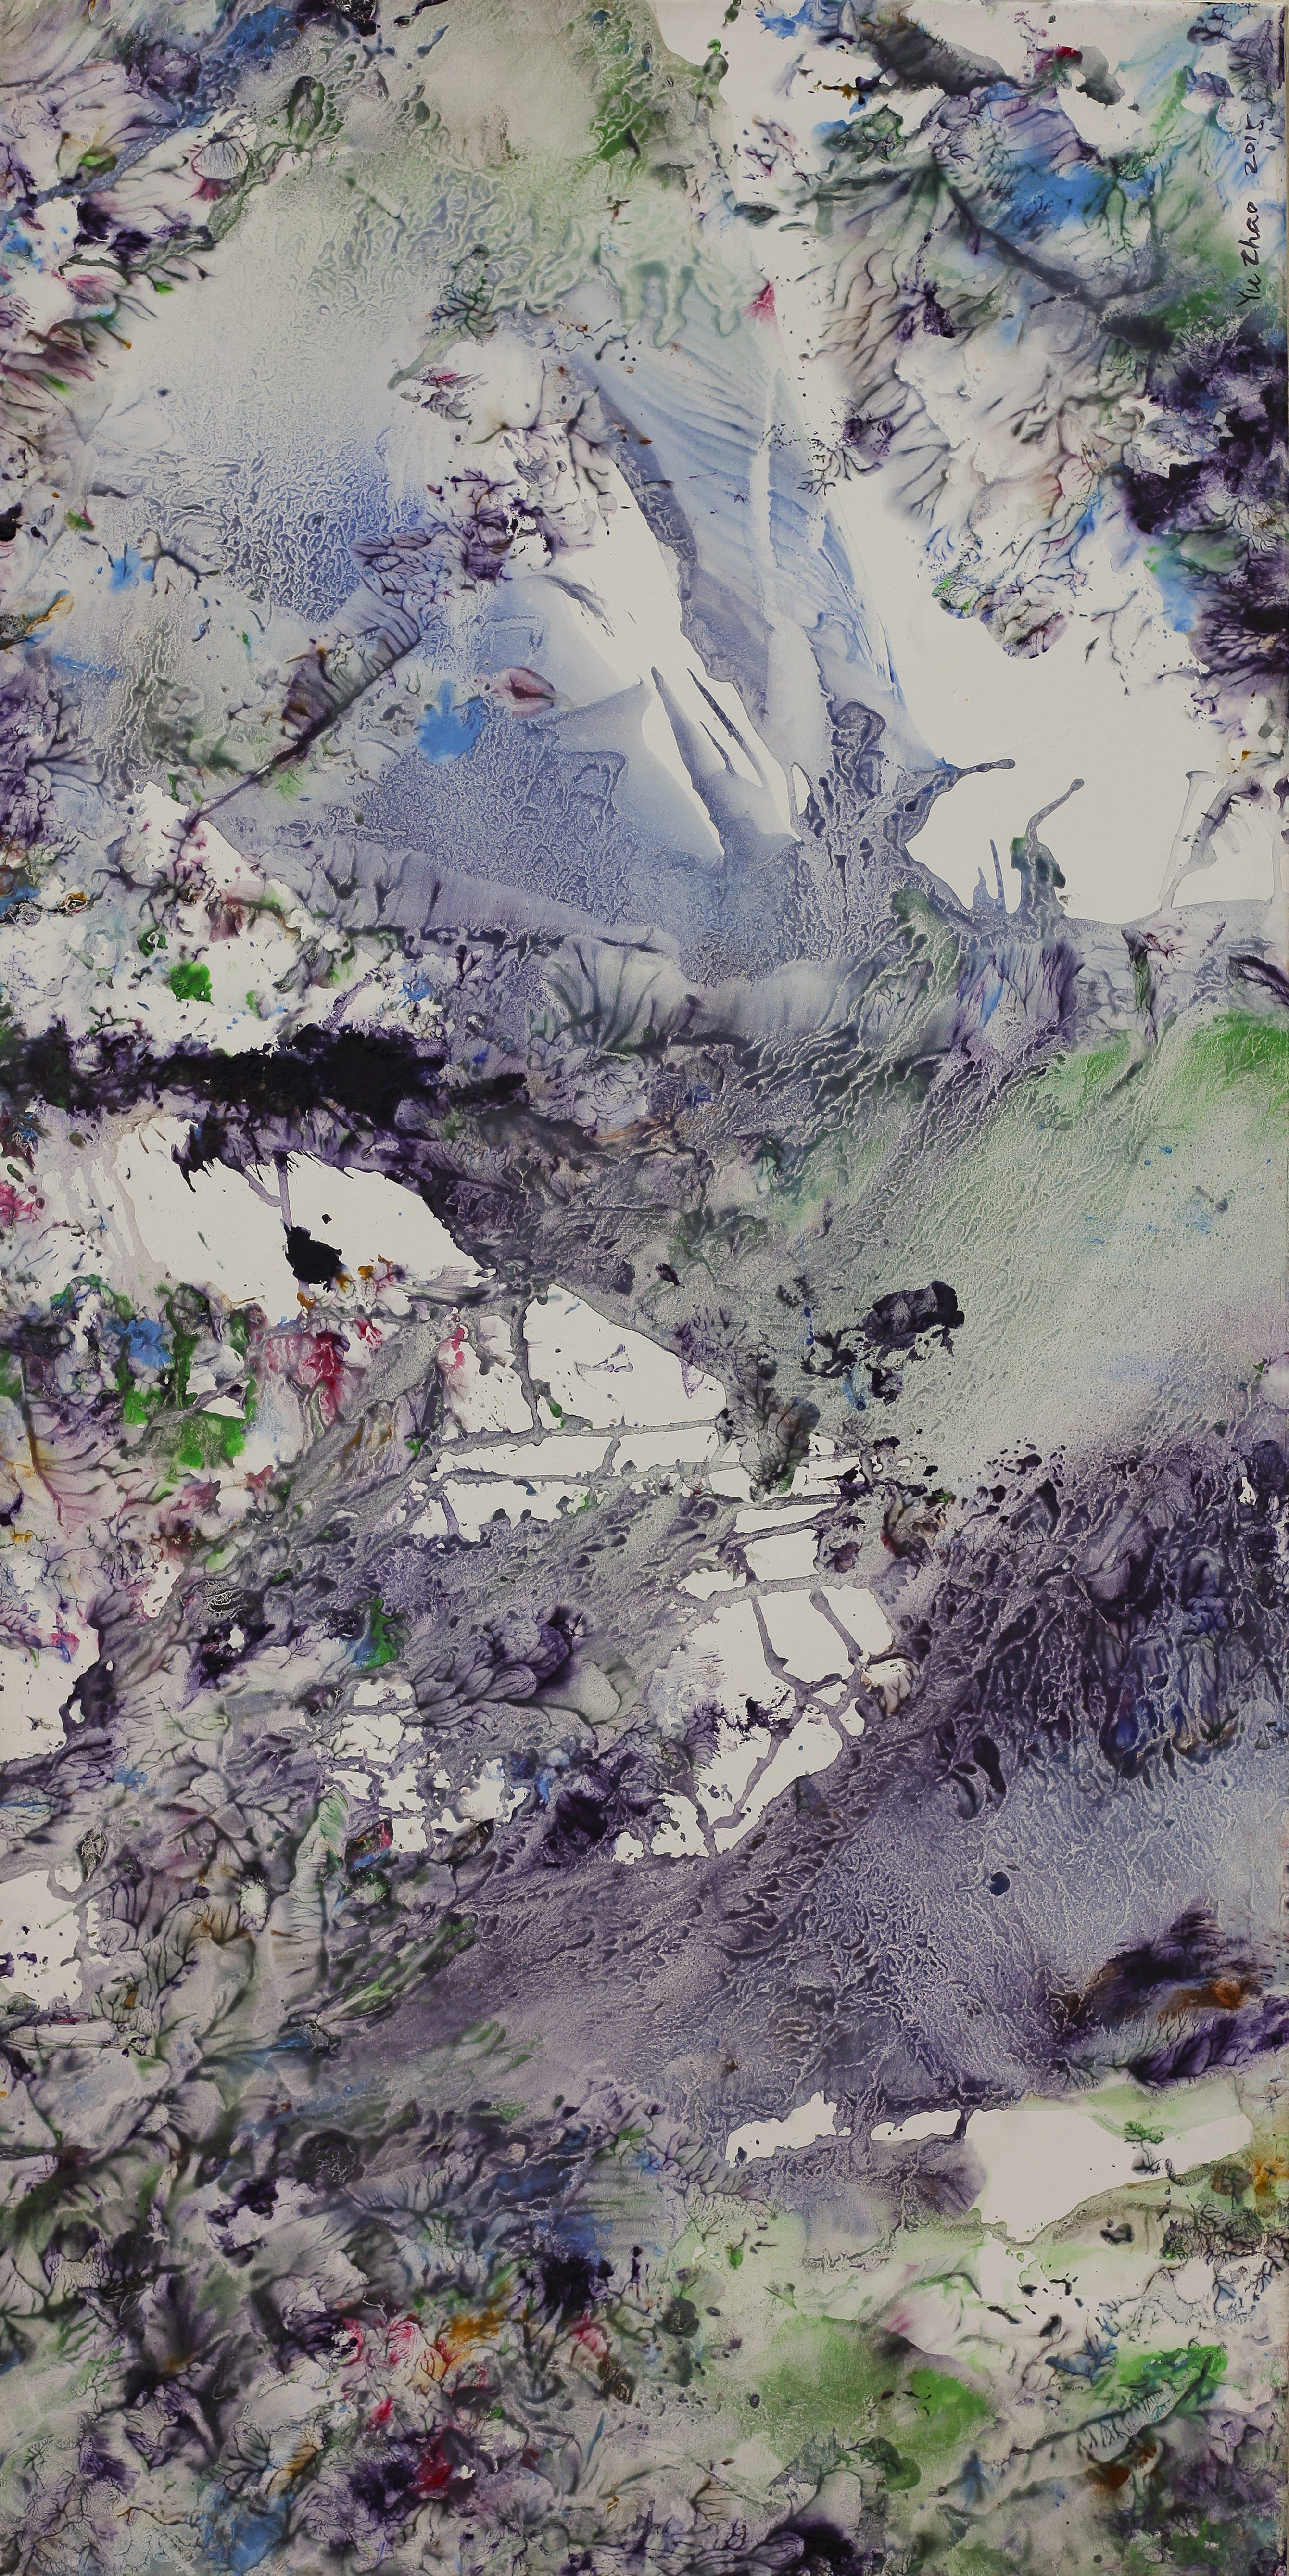 Yu Zhao, Arbre printanier, tempera/paper/canvas, 100x50cm, 2015